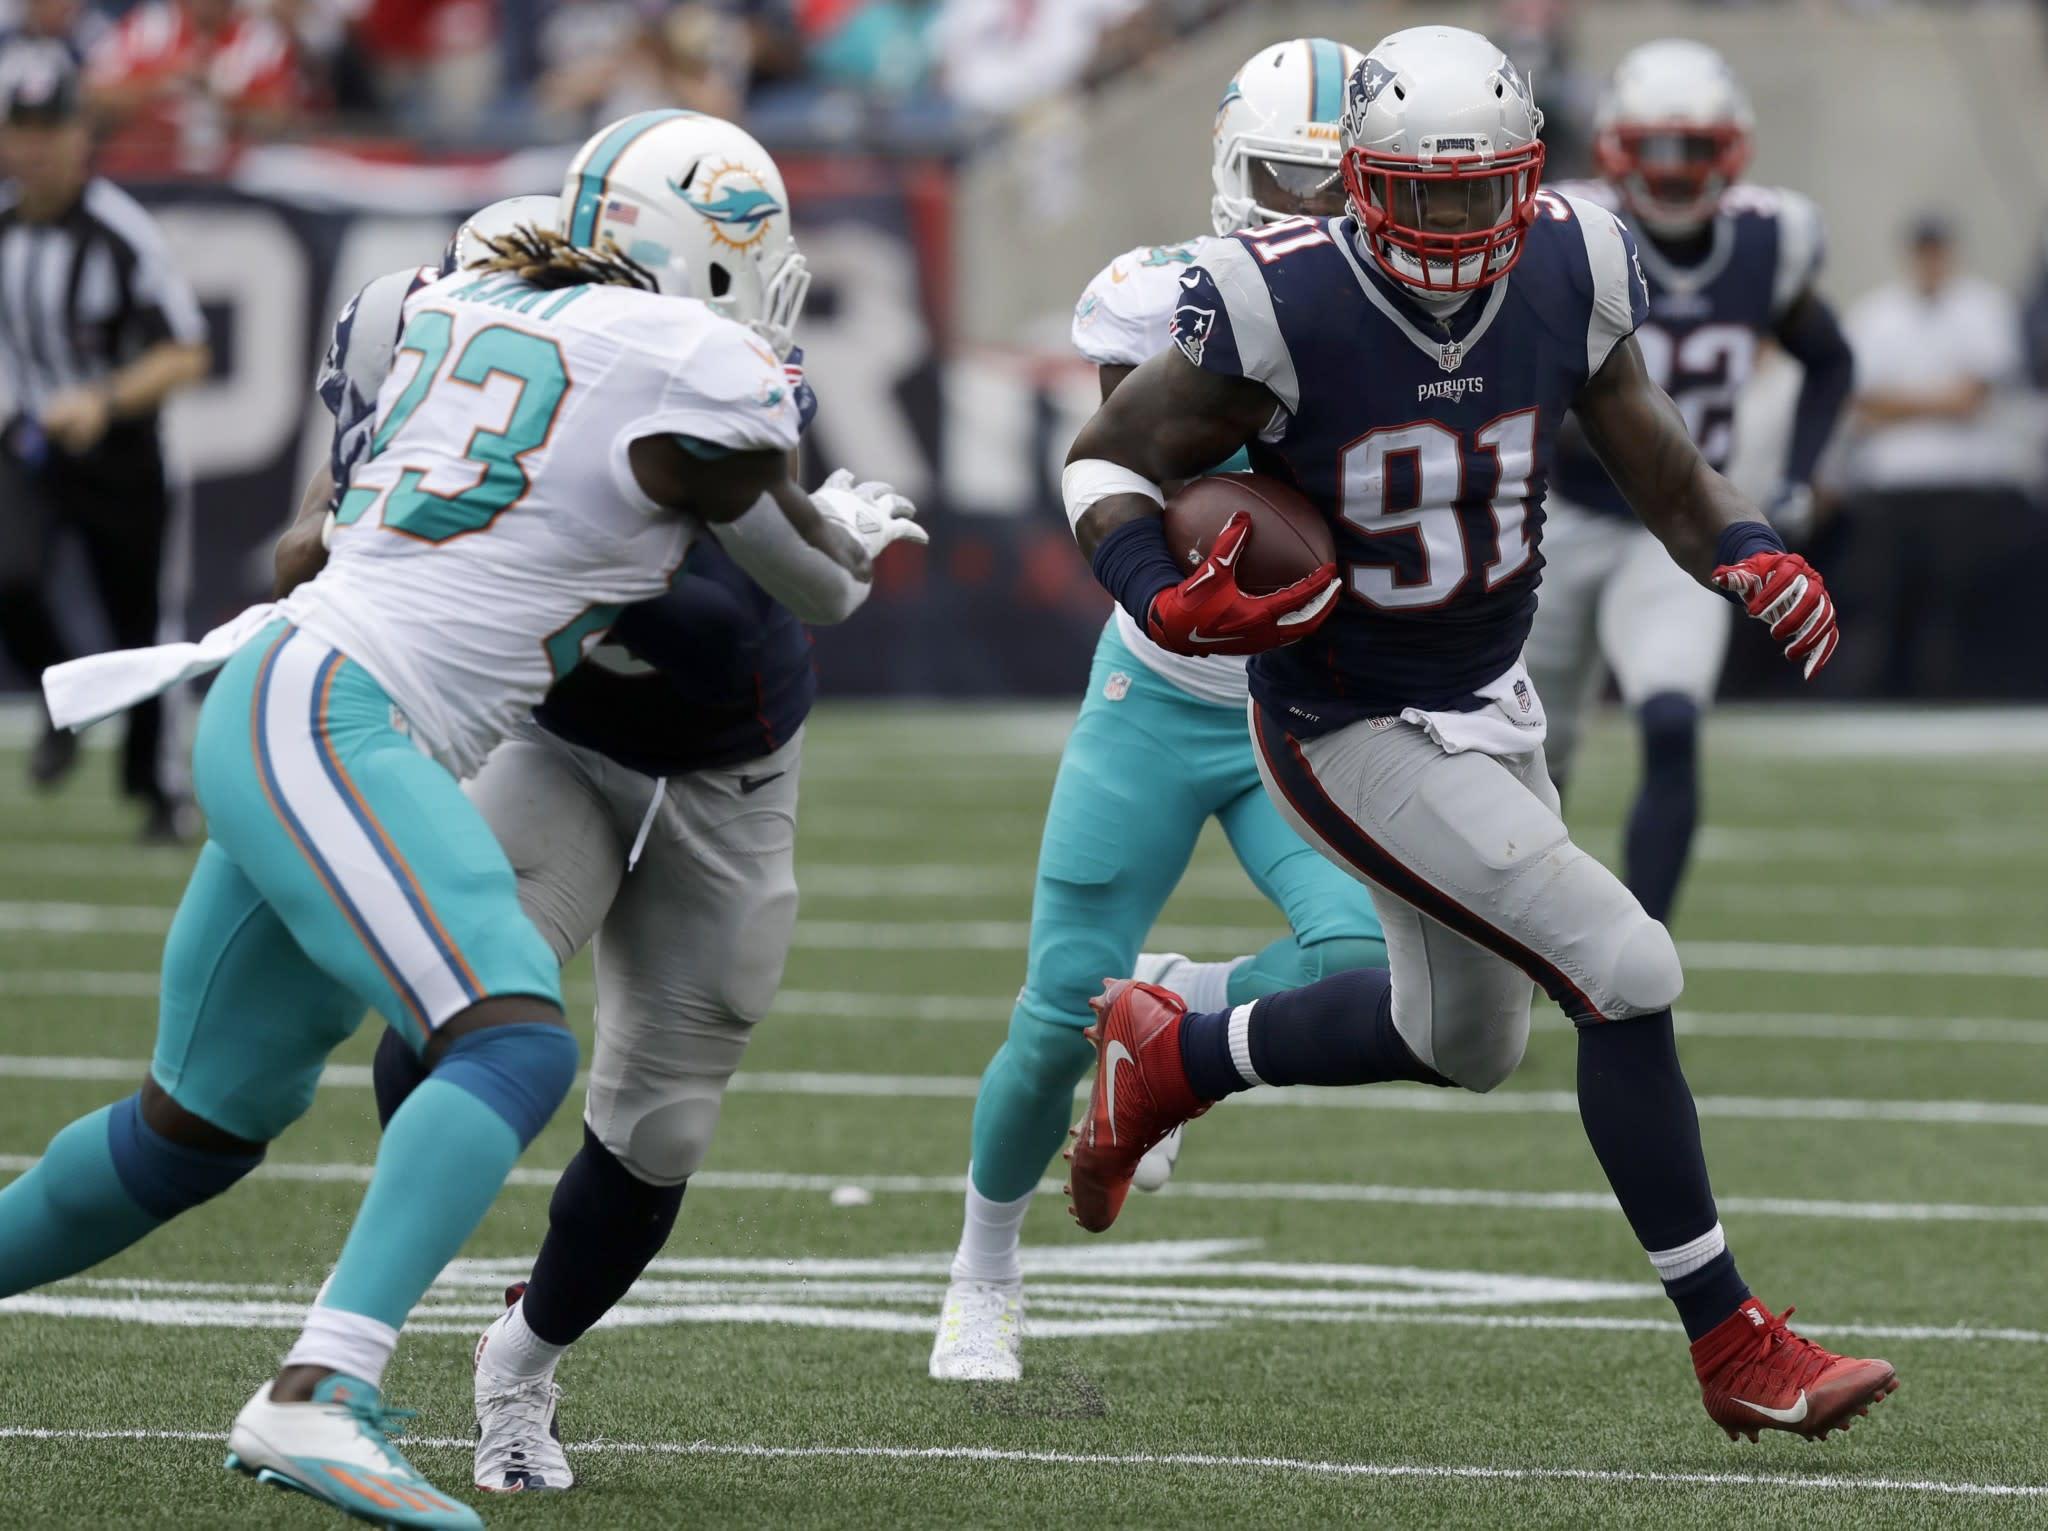 Trade surprise Patriots send LB Jamie Collins to Cleveland